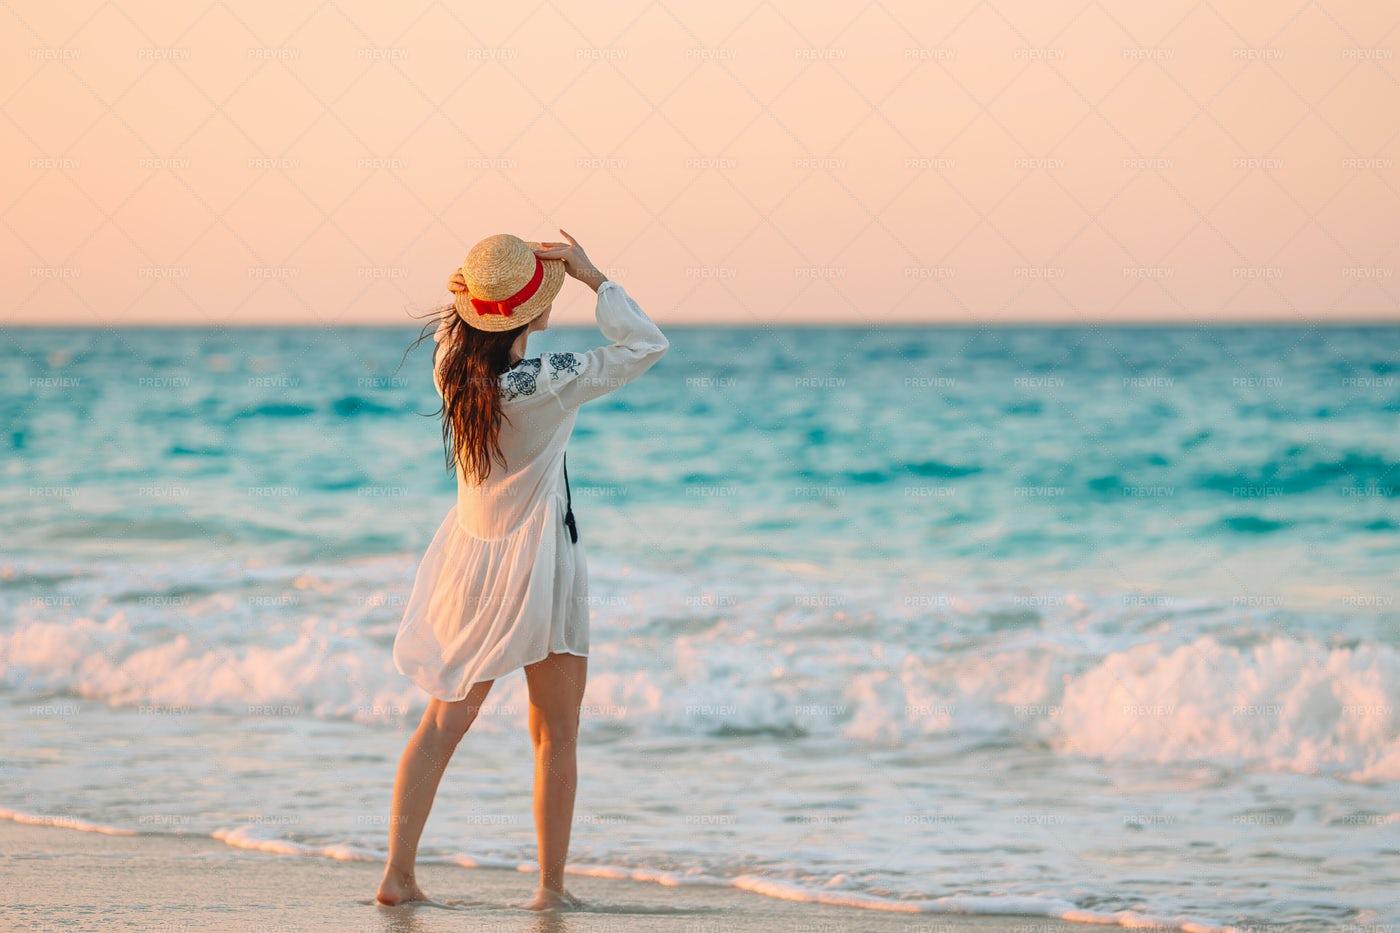 Woman On Windy Beach Shore: Stock Photos